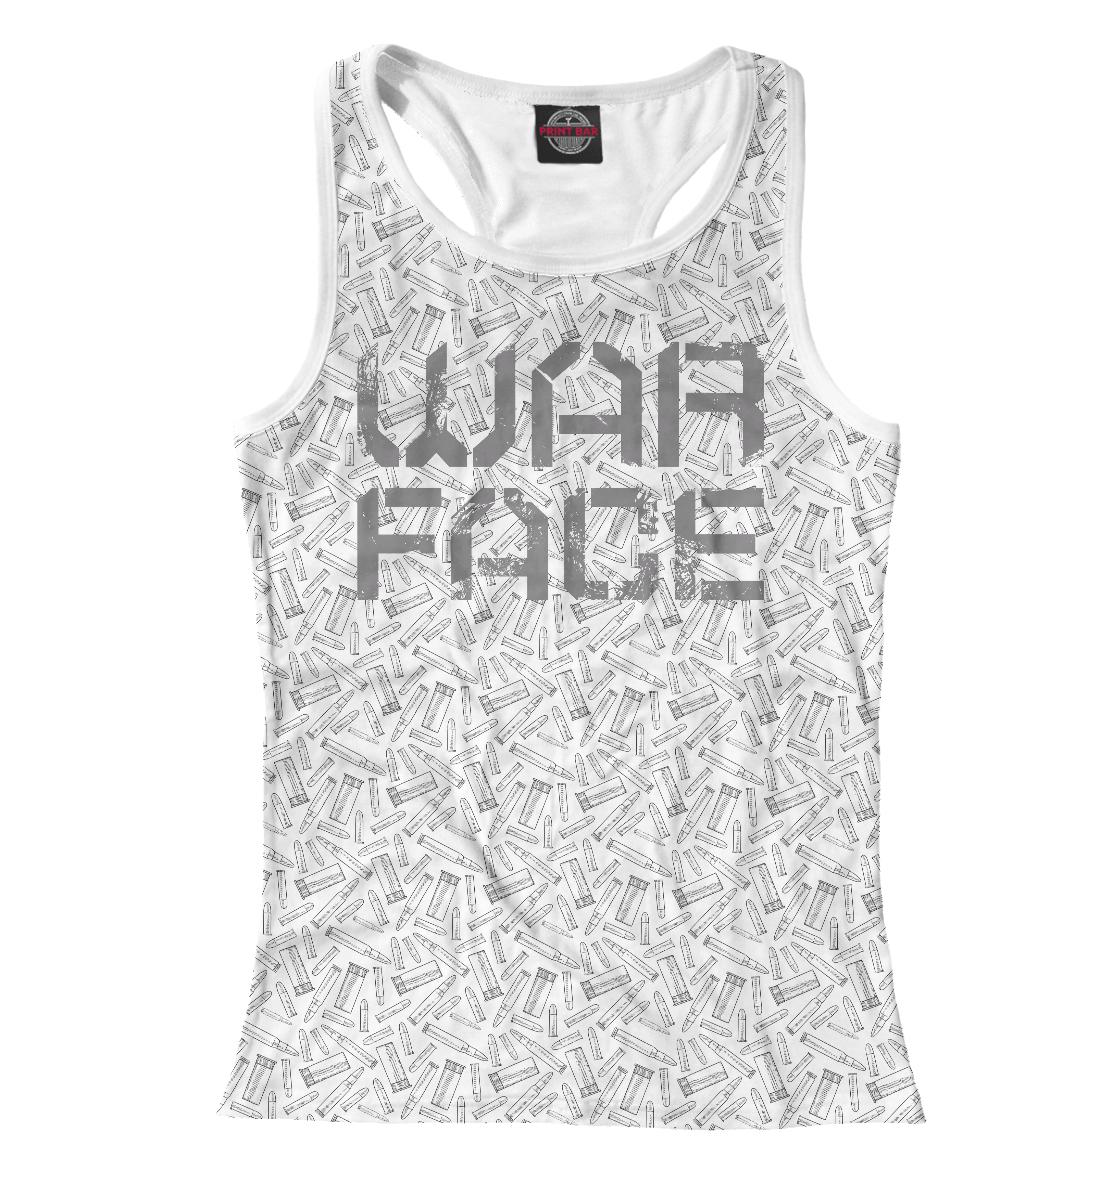 Купить Warface, Printbar, Майки борцовки, RPG-126789-mayb-1